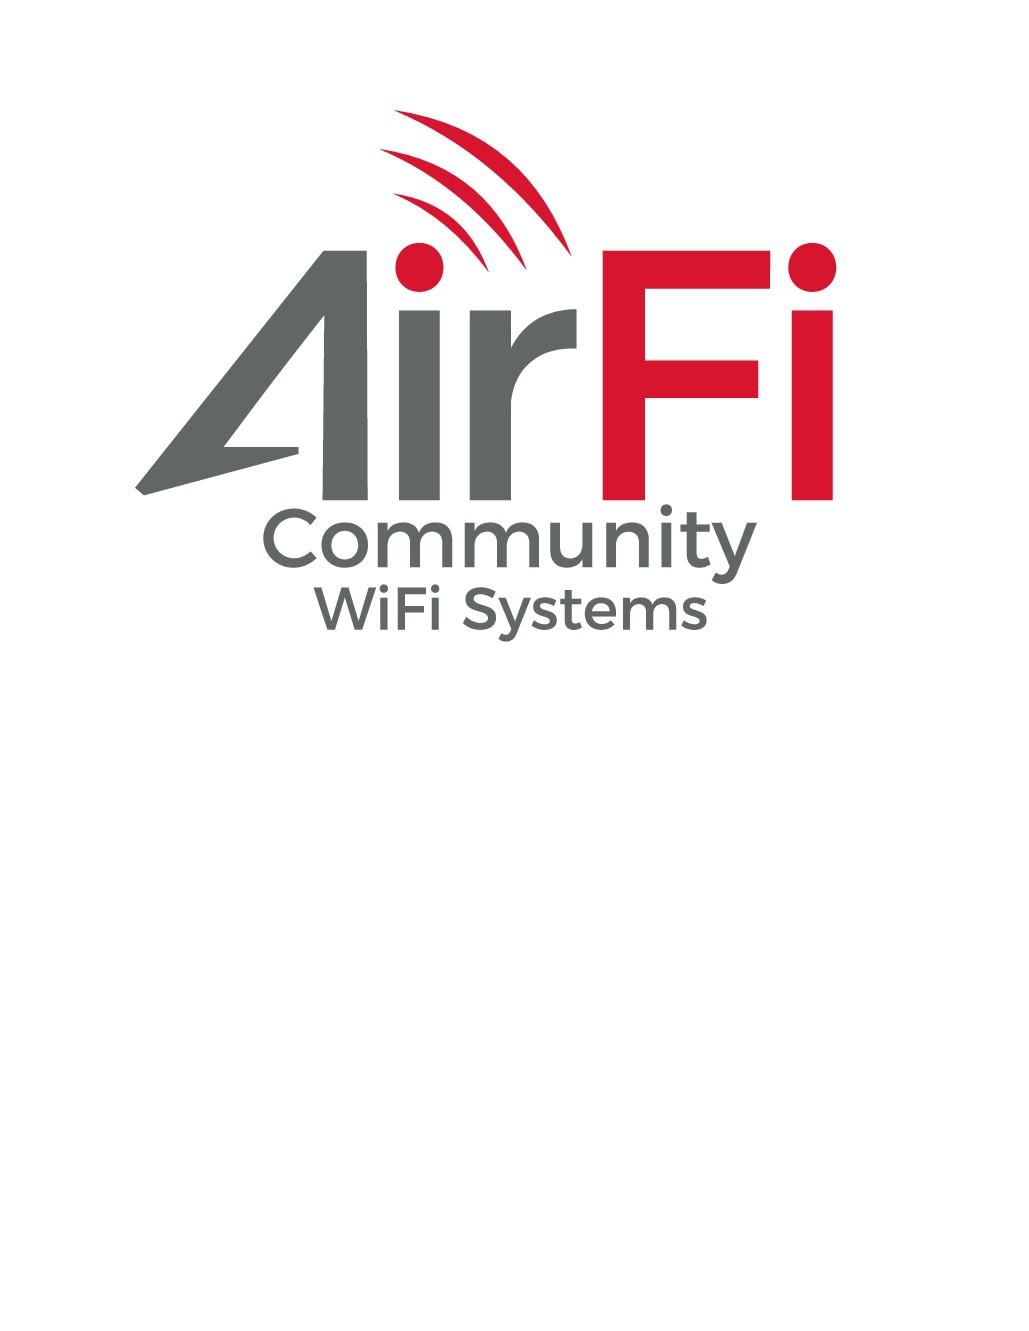 Community WiFi Internet System Provider